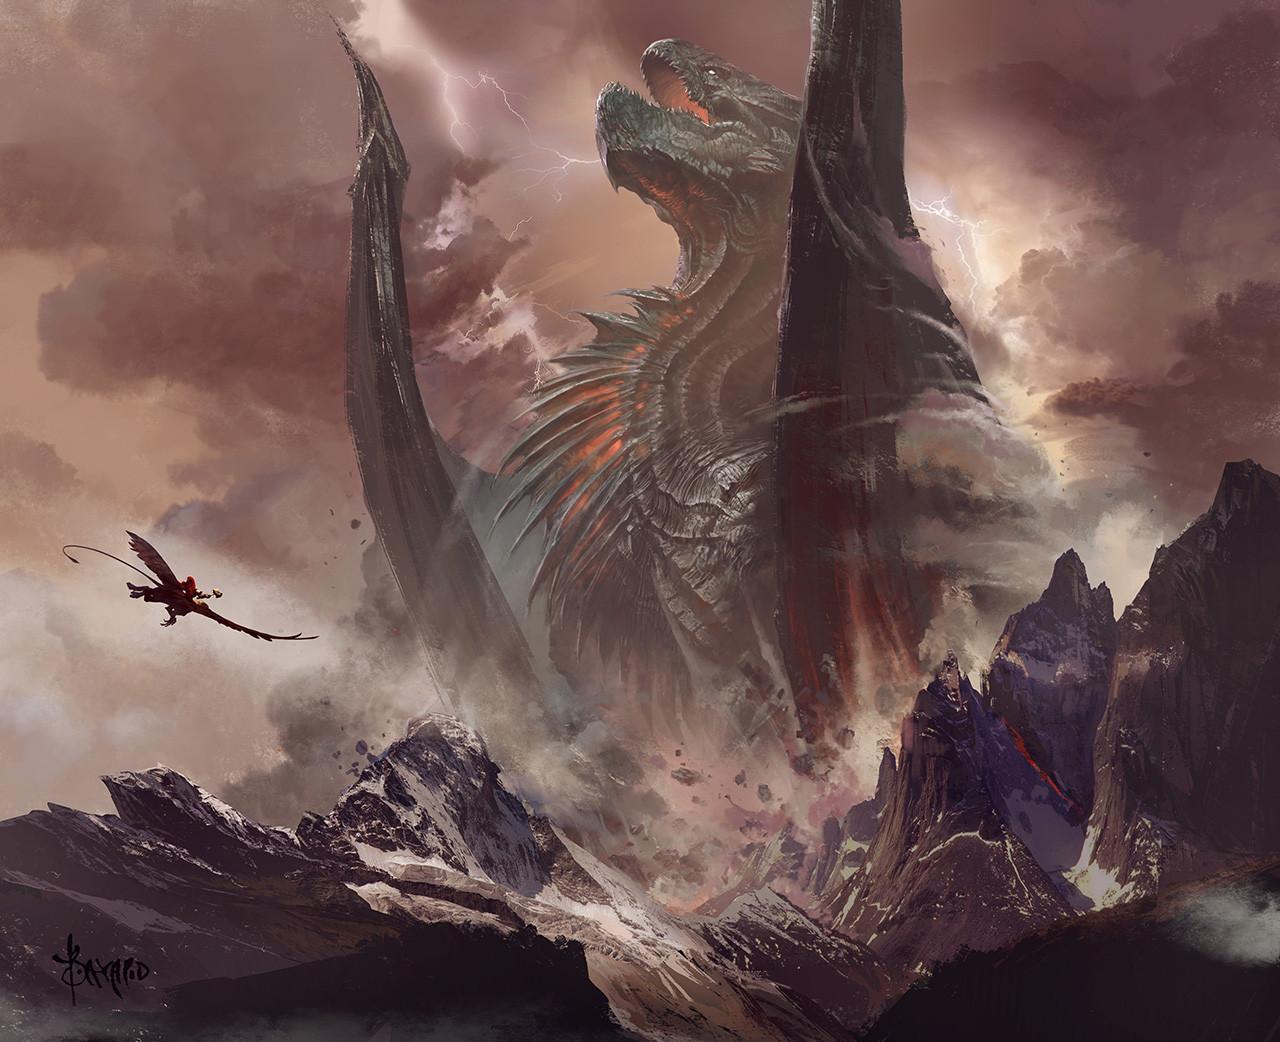 Les fabuleuses illustrations en digital painting de Bayard Wu